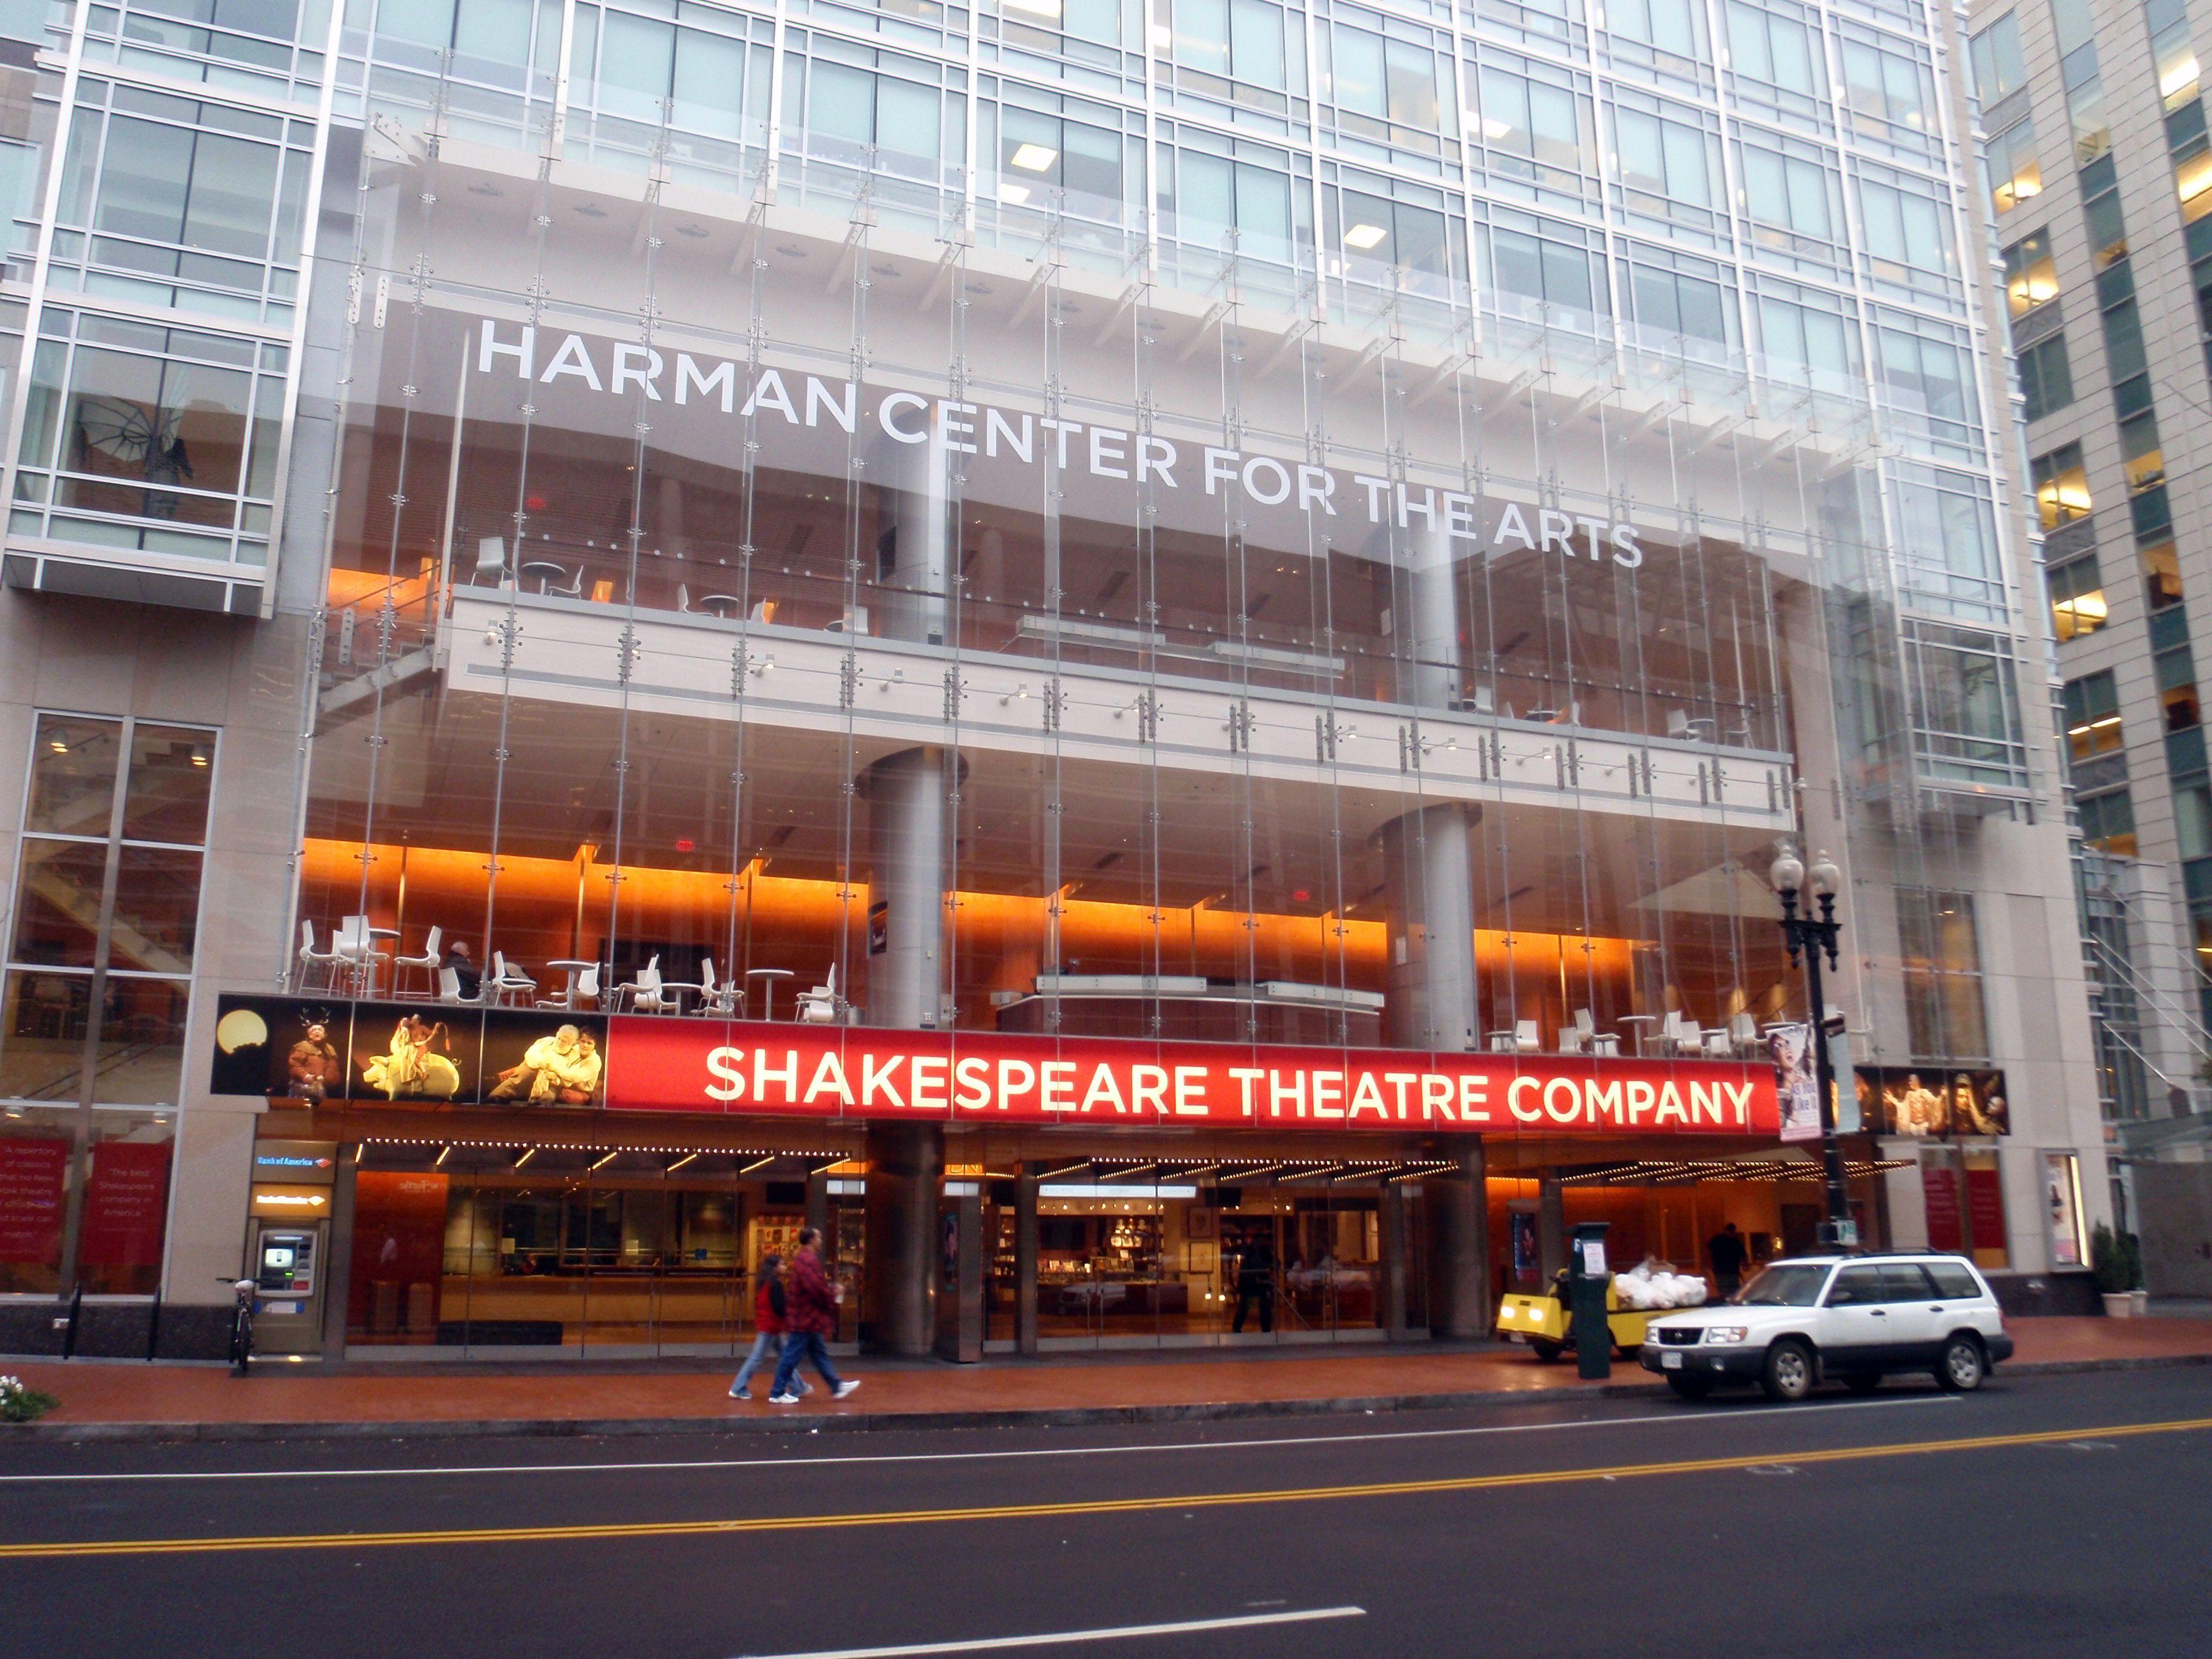 Shakespeare Theatre